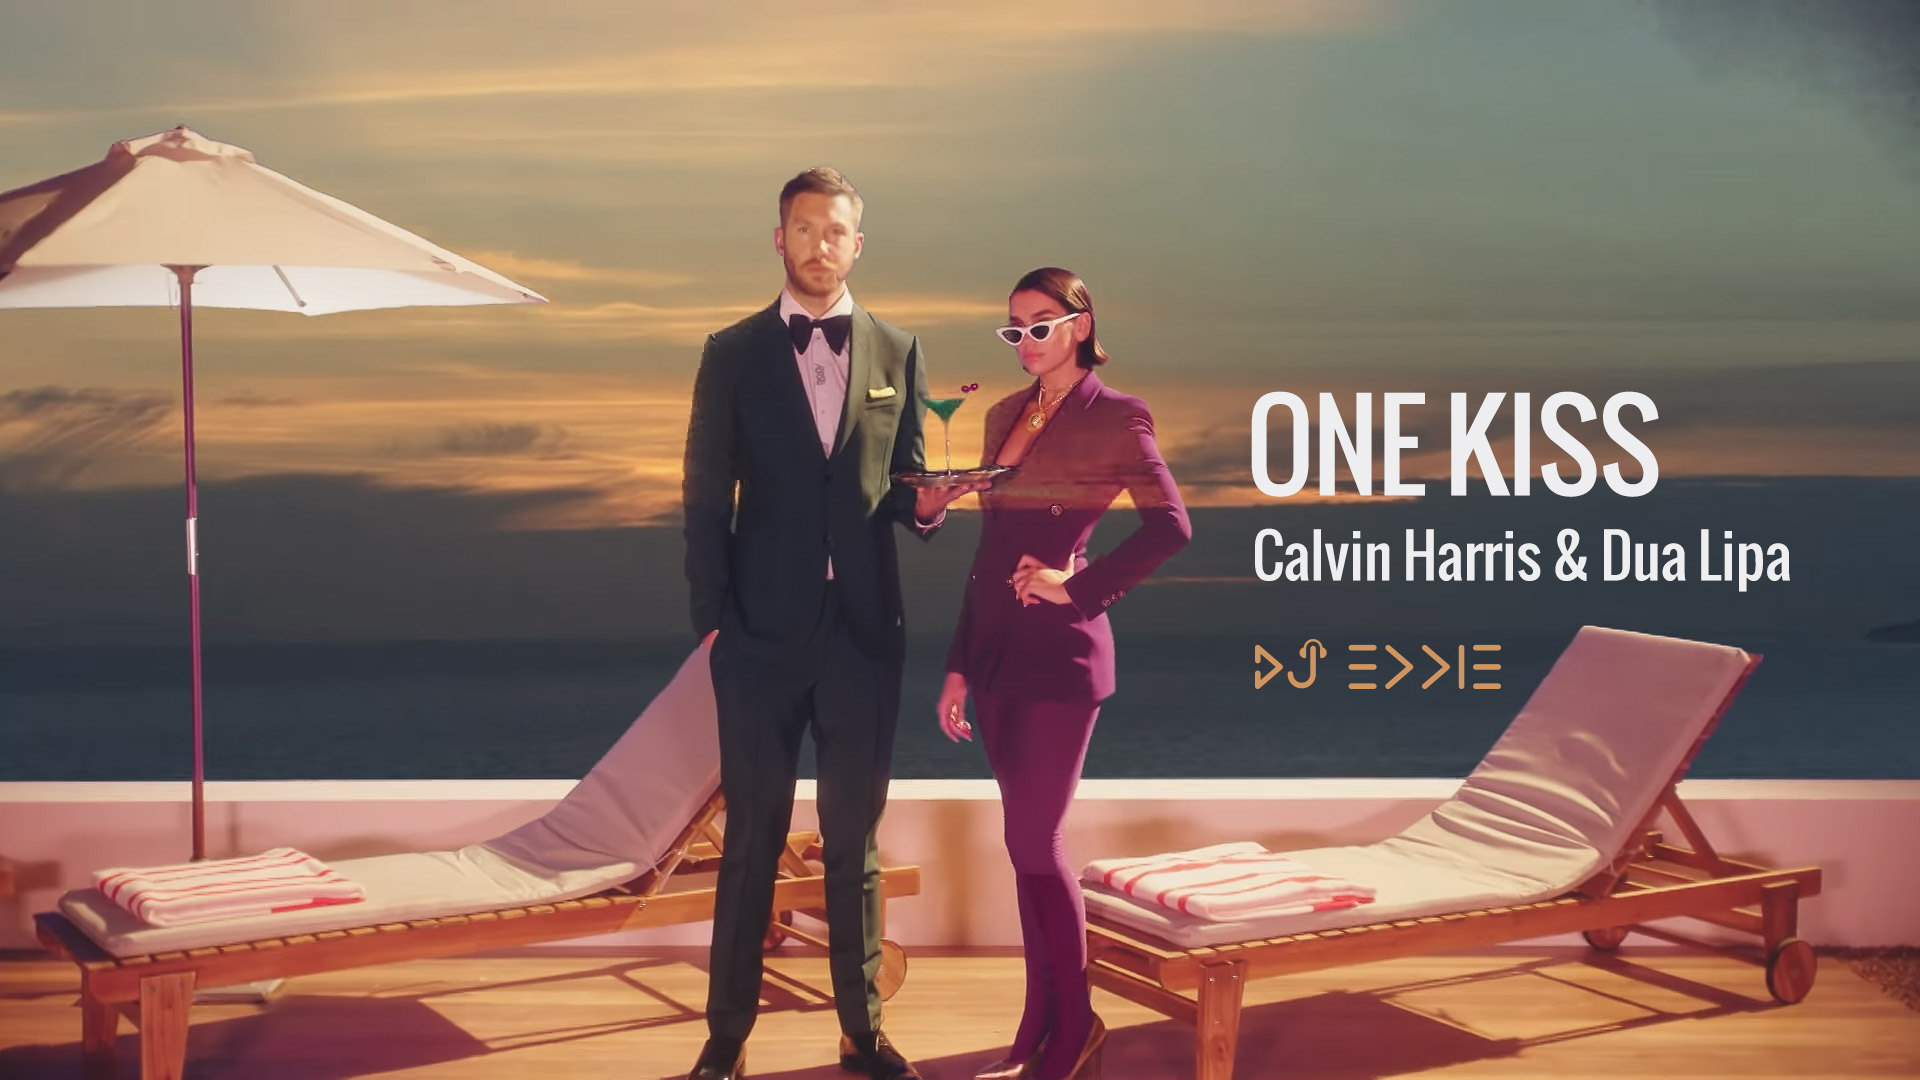 Calvin Harris, Dua Lipa - One Kiss